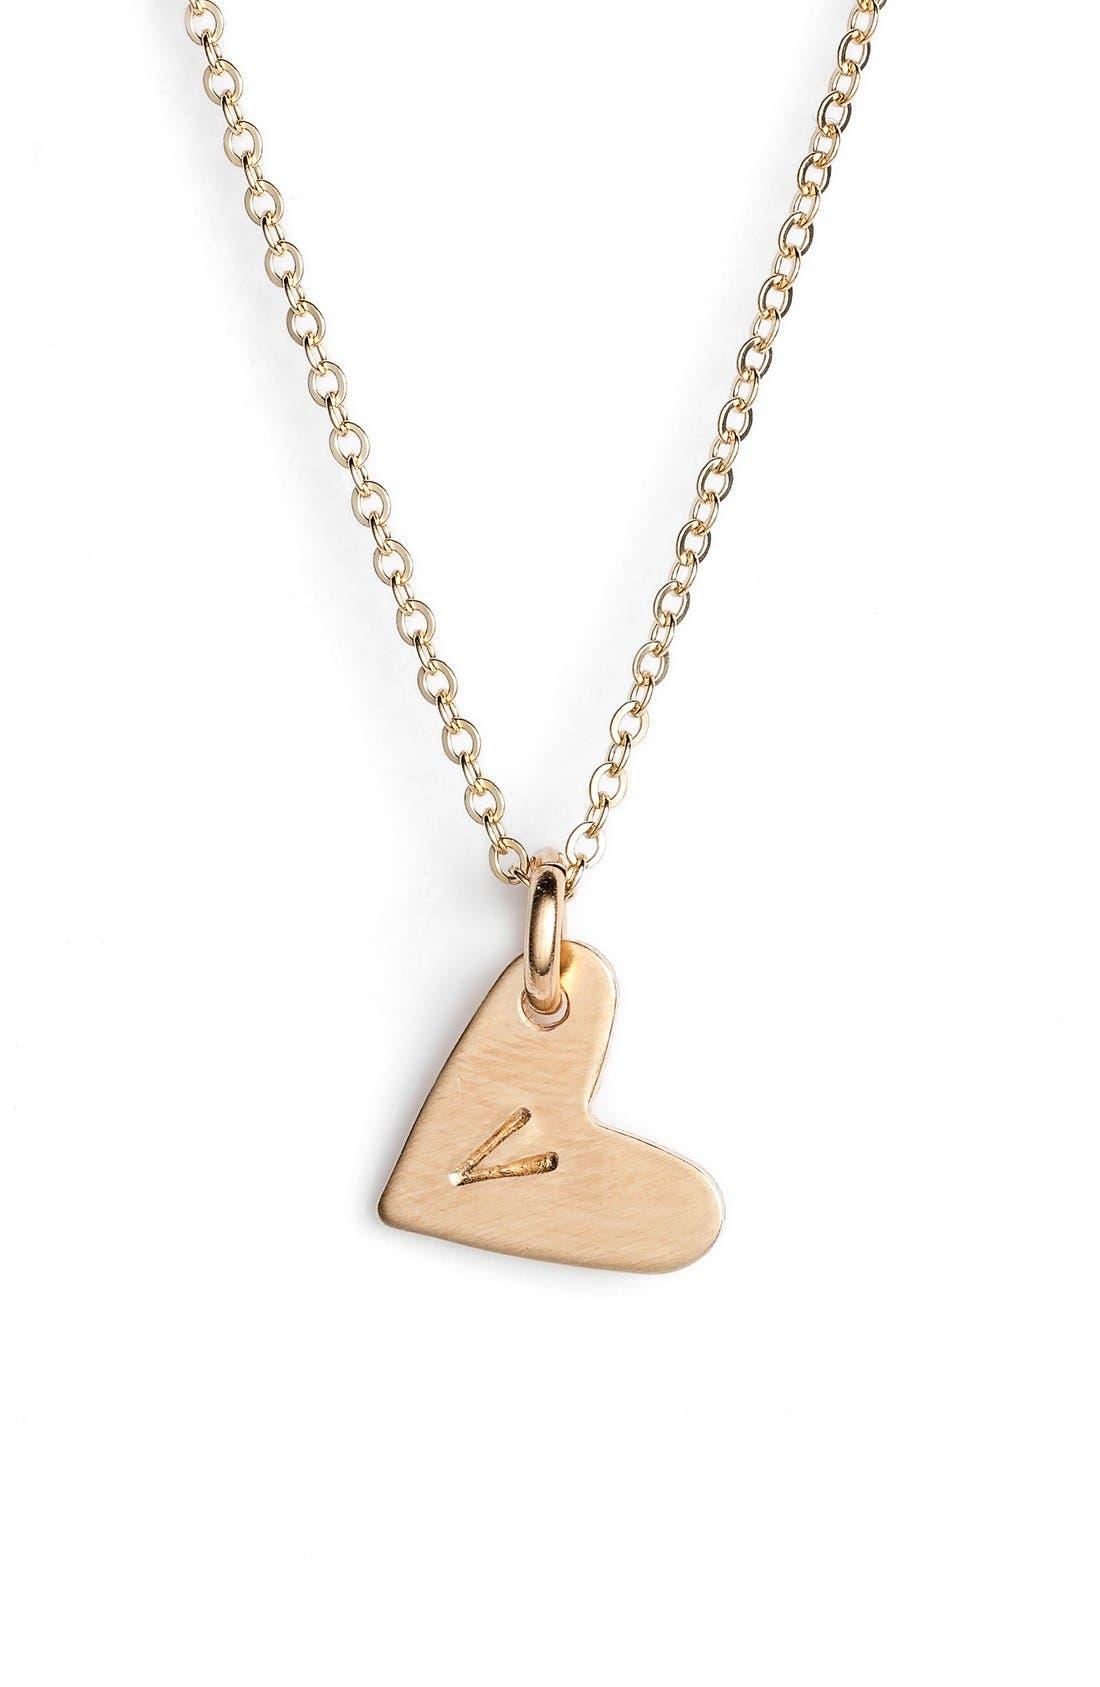 Alternate Image 1 Selected - Nashelle 14k-Gold Fill Initial Mini Heart Pendant Necklace